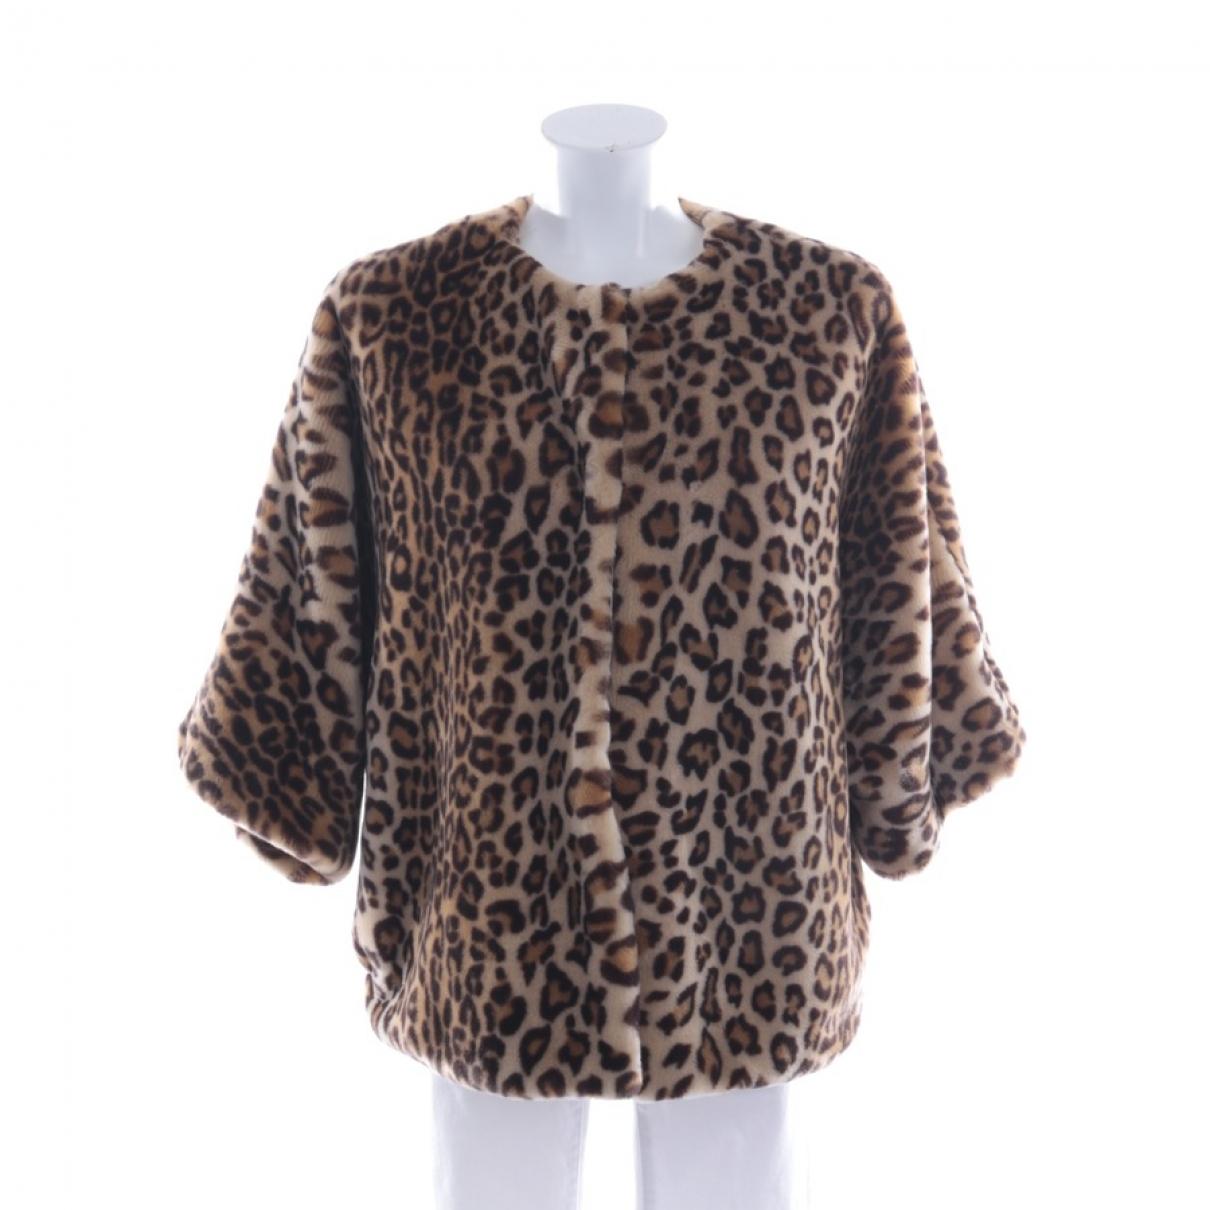 Max Mara \N Brown jacket for Women 36 FR